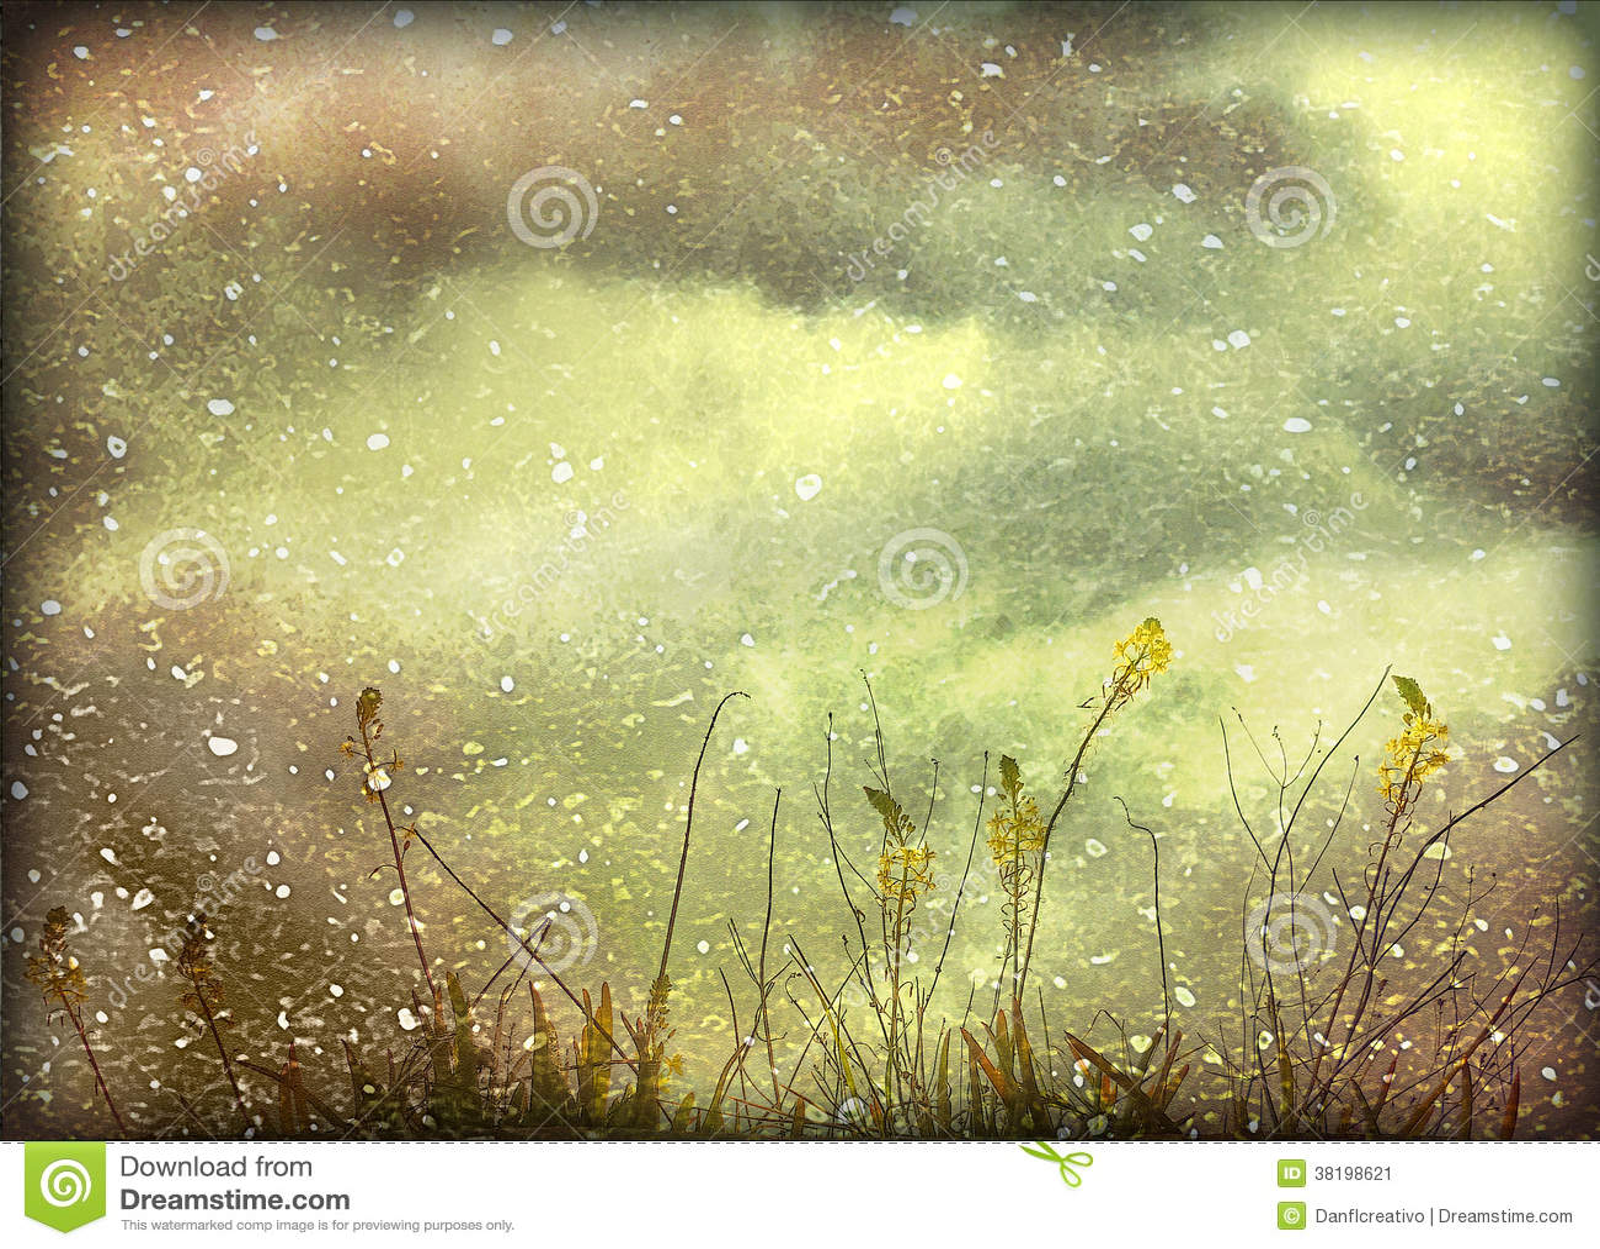 dreamy grunge nature background stock illustration - illustration of